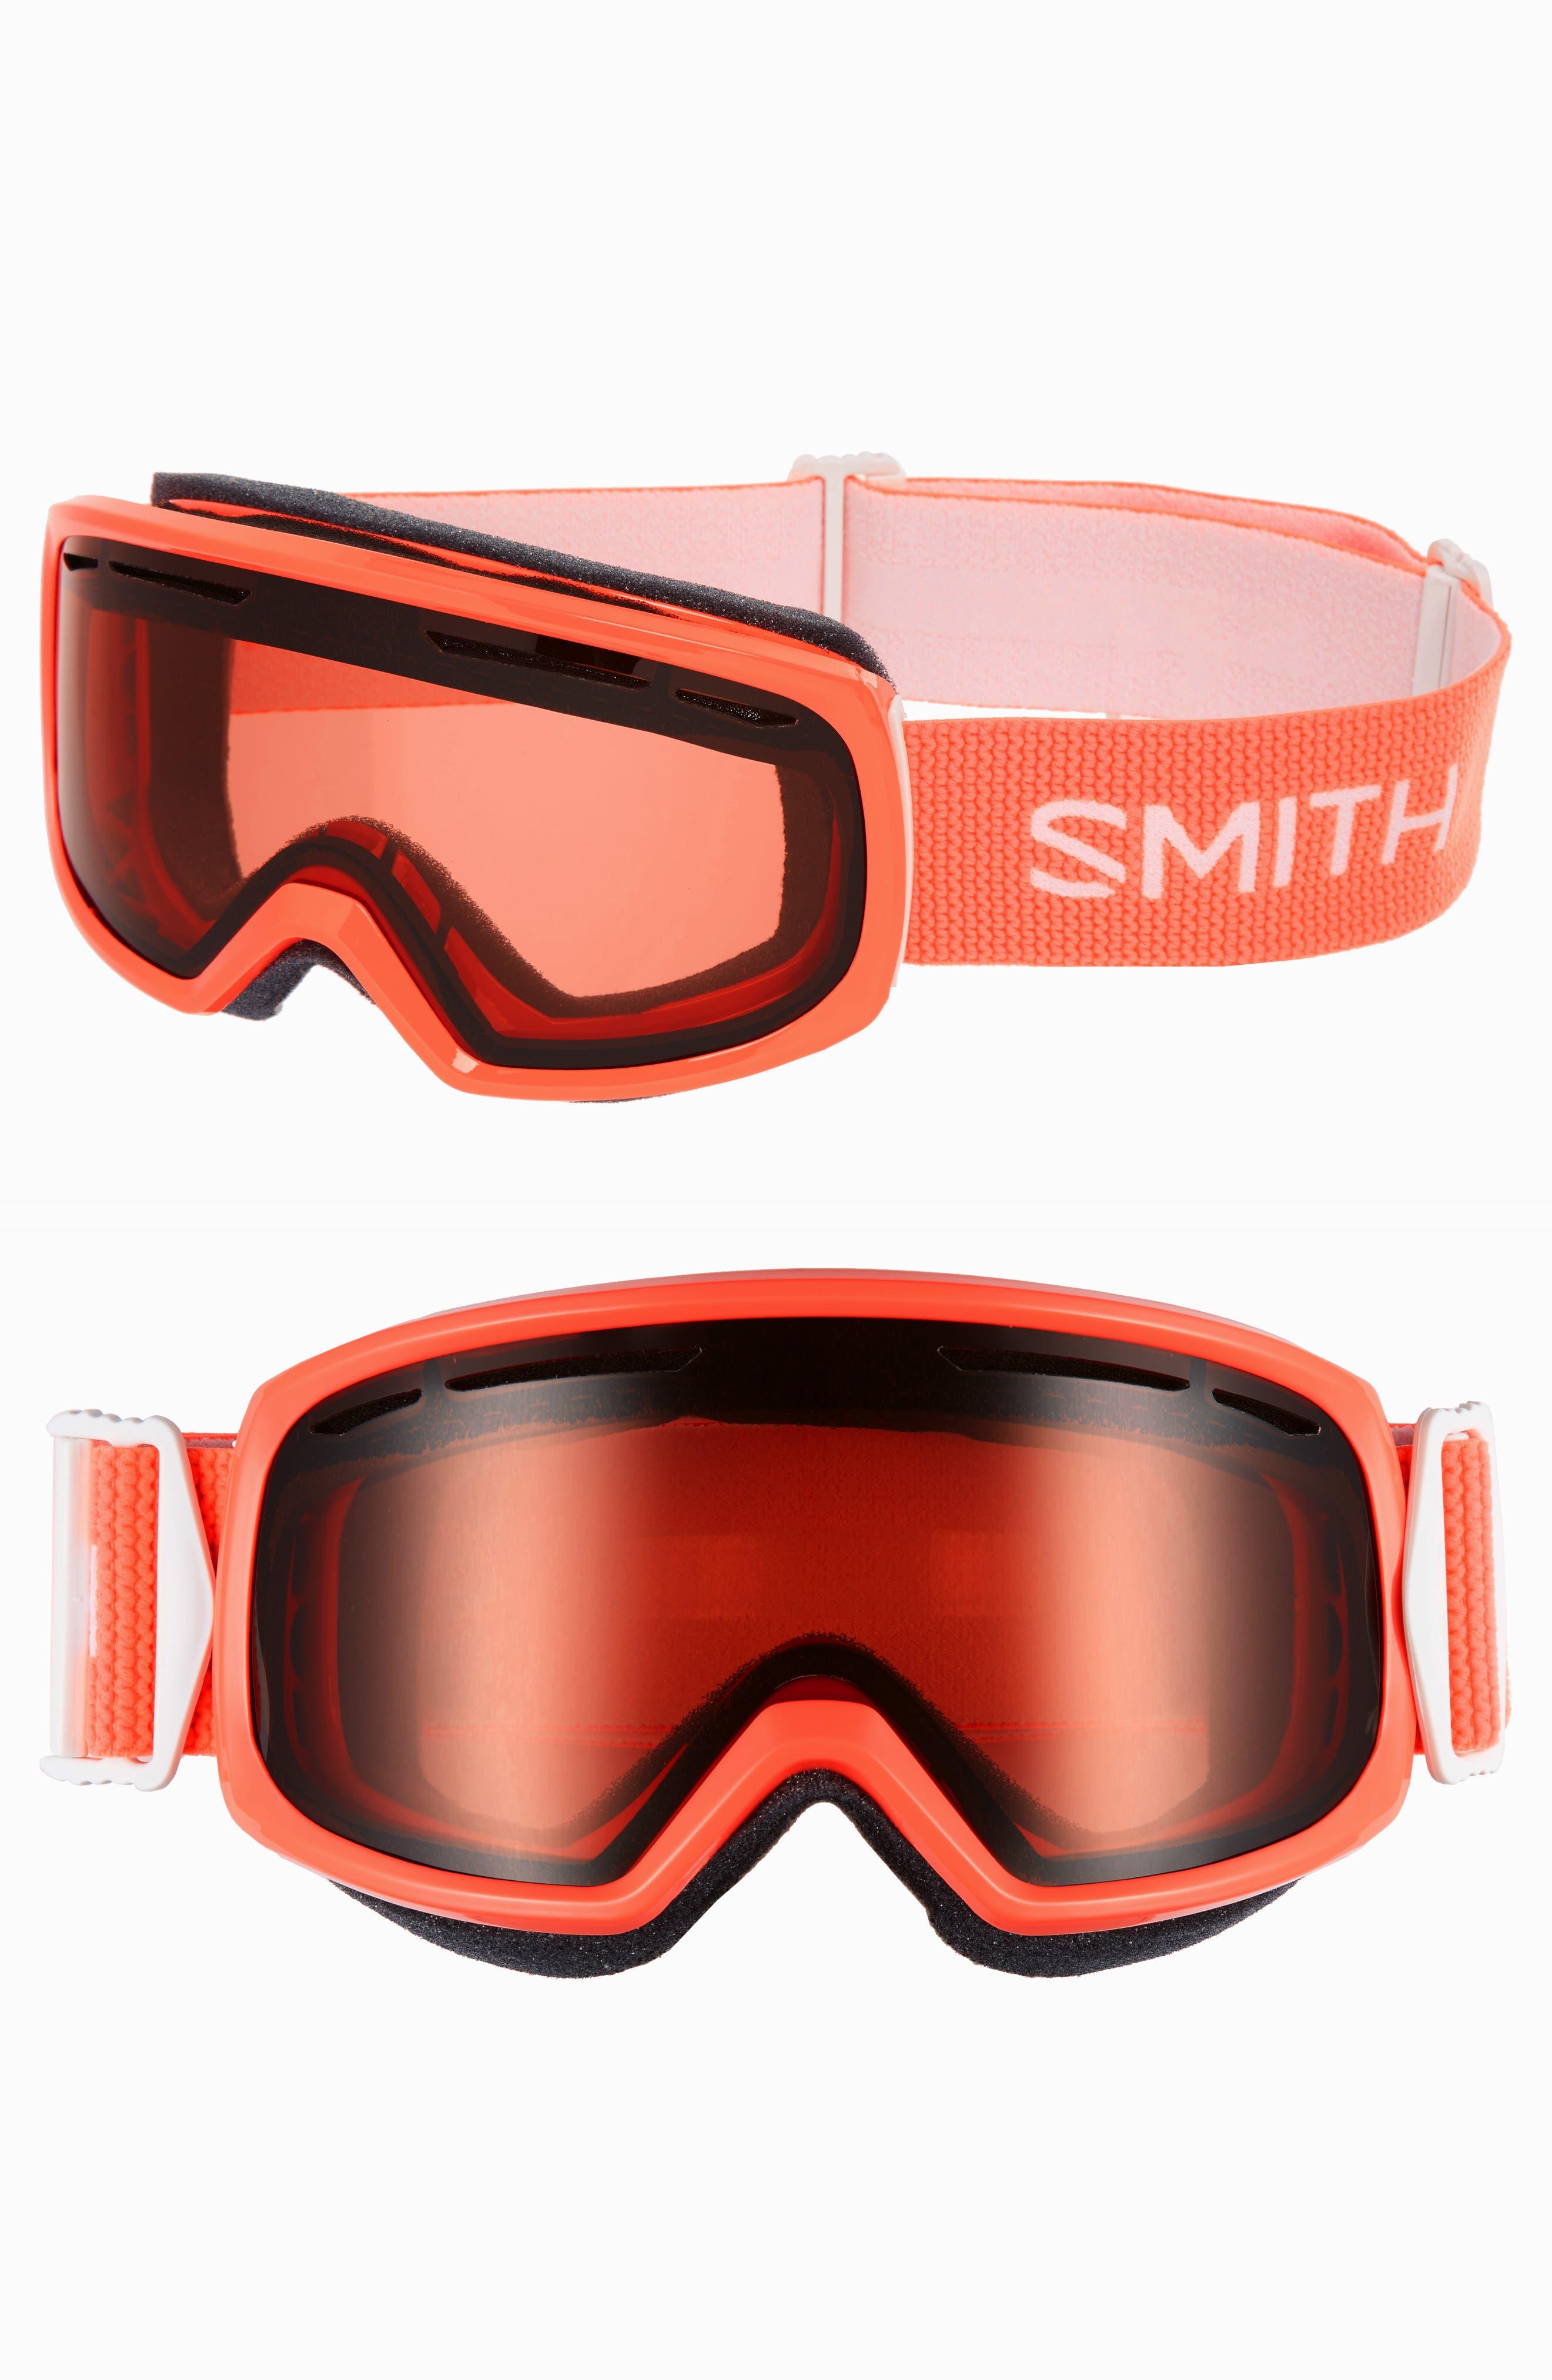 a7f40a2011f Smith Drift 180Mm Snow Goggles - Sunburst